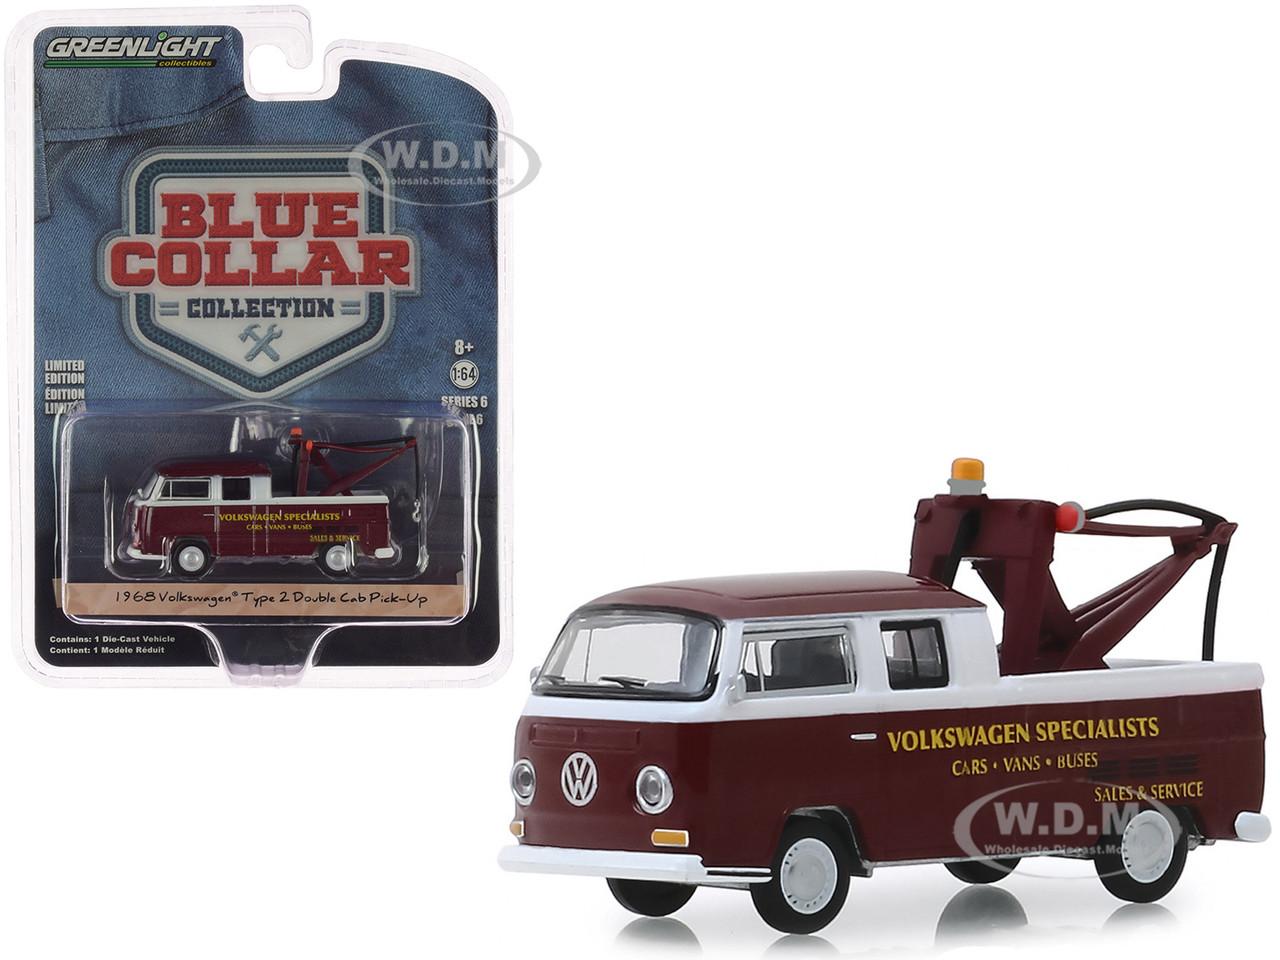 GreenLight 1:64 VW Volkswagen Bus tipo 2 1968-blue collar serie 3